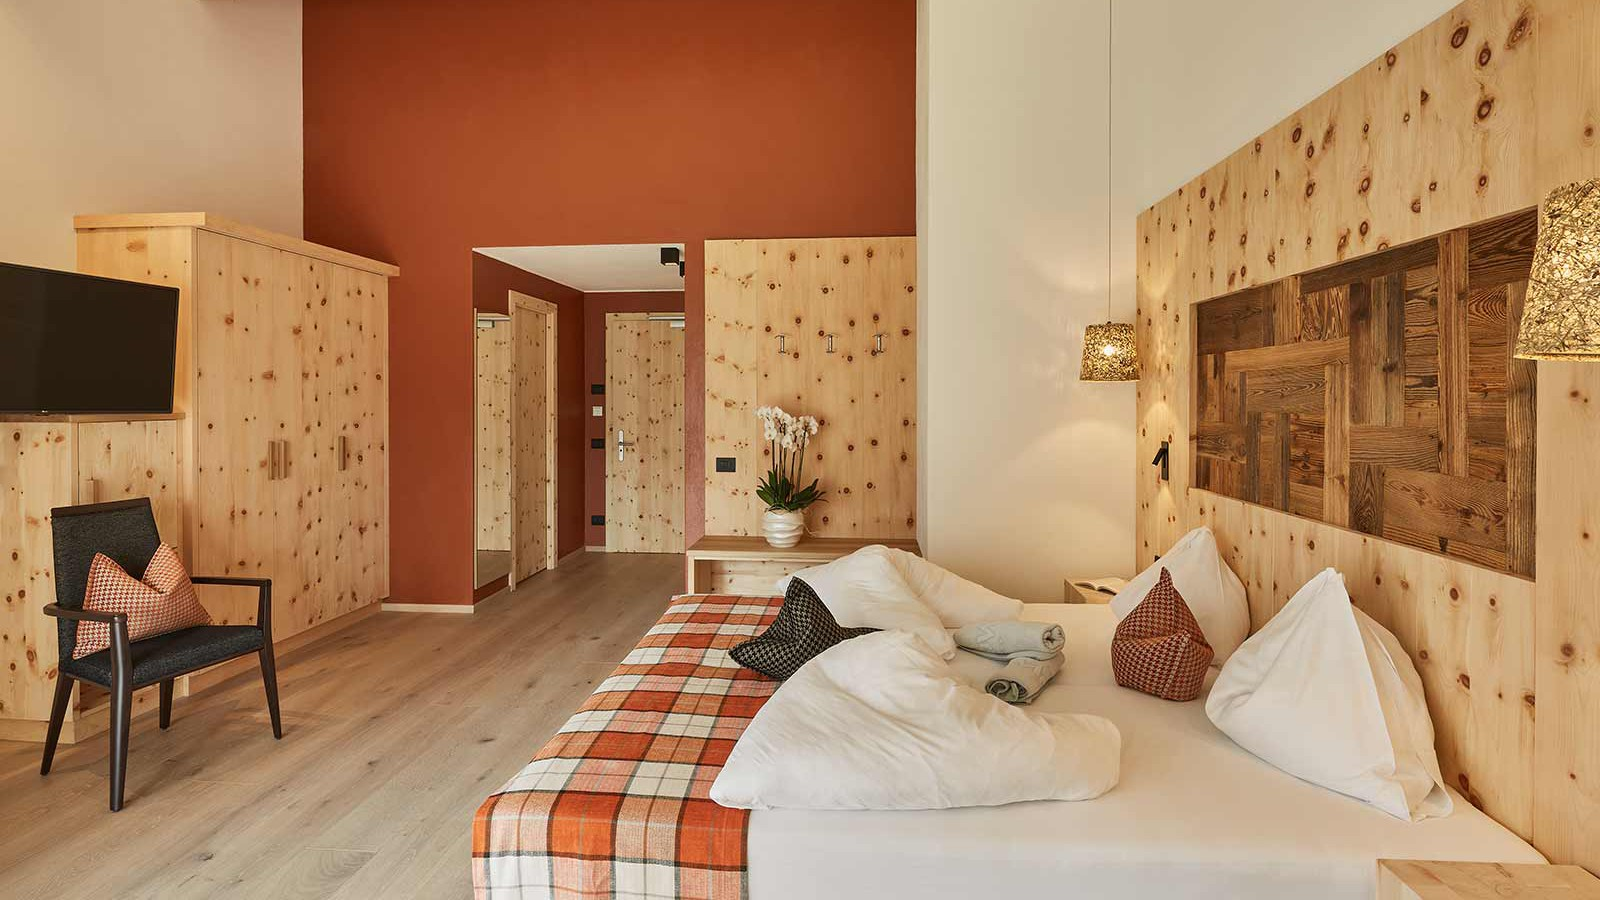 Hotel Mezdi, Corvara and Colfosco - Rooms